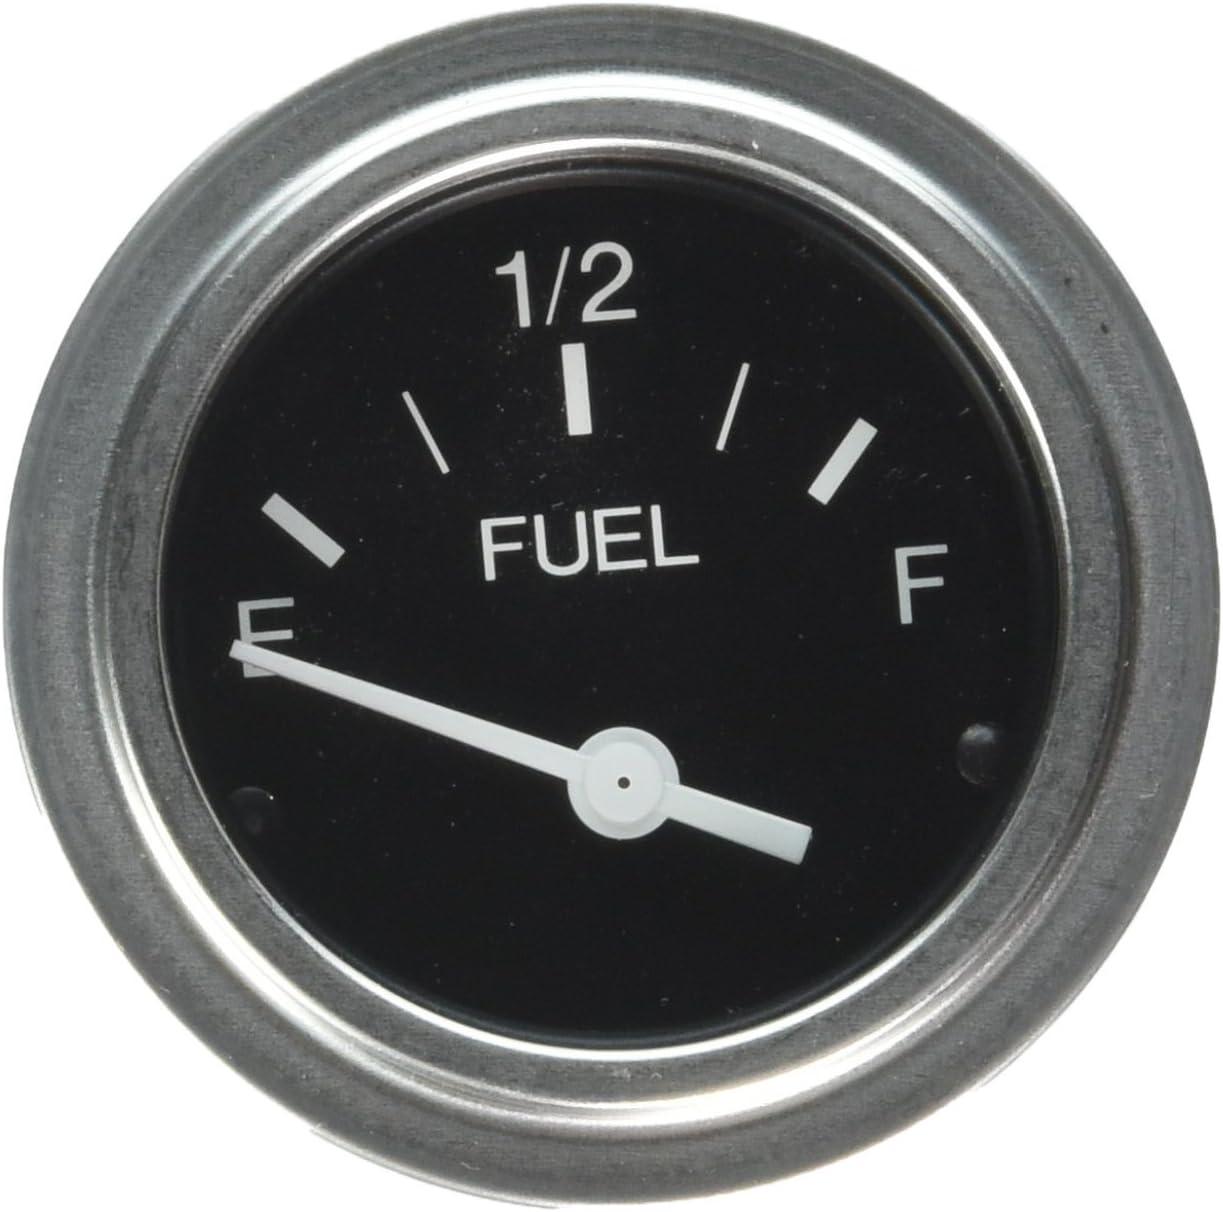 2 Sierra International 80150P Heavy Duty Fuel Gauge for Inboard /& Diesel Engines